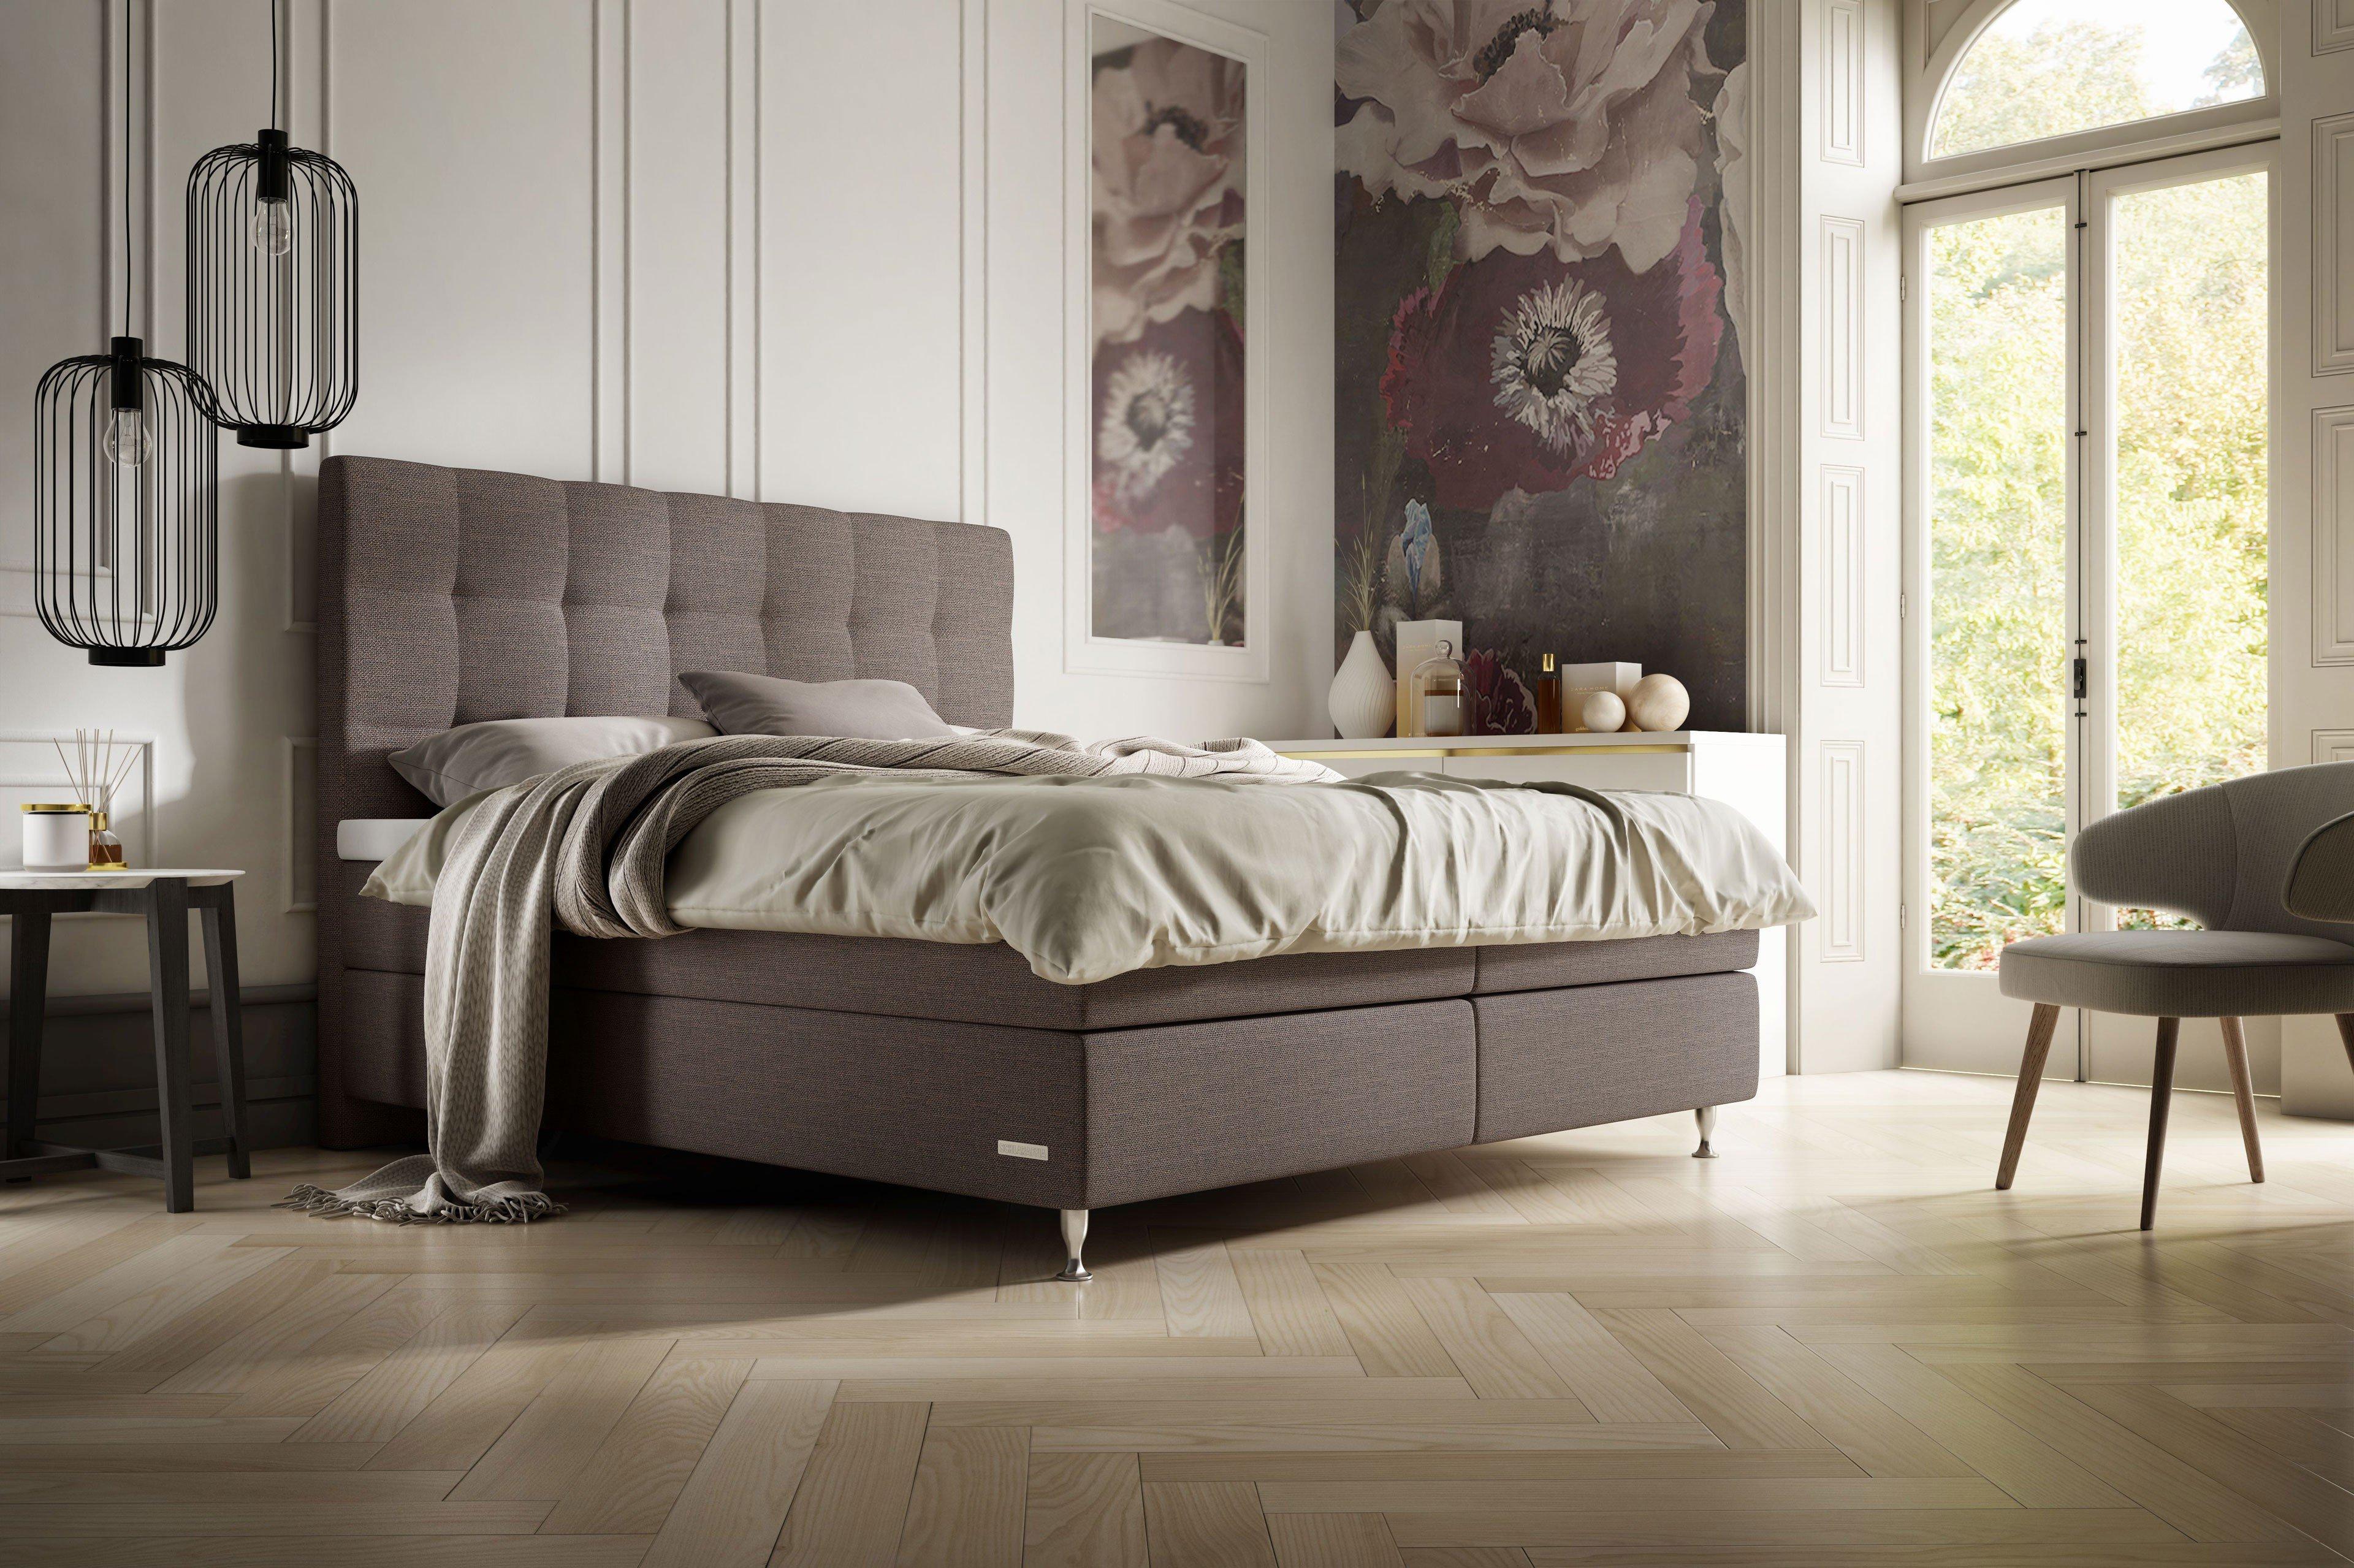 schlaraffia boxspringbett ayda in petrol m bel letz. Black Bedroom Furniture Sets. Home Design Ideas